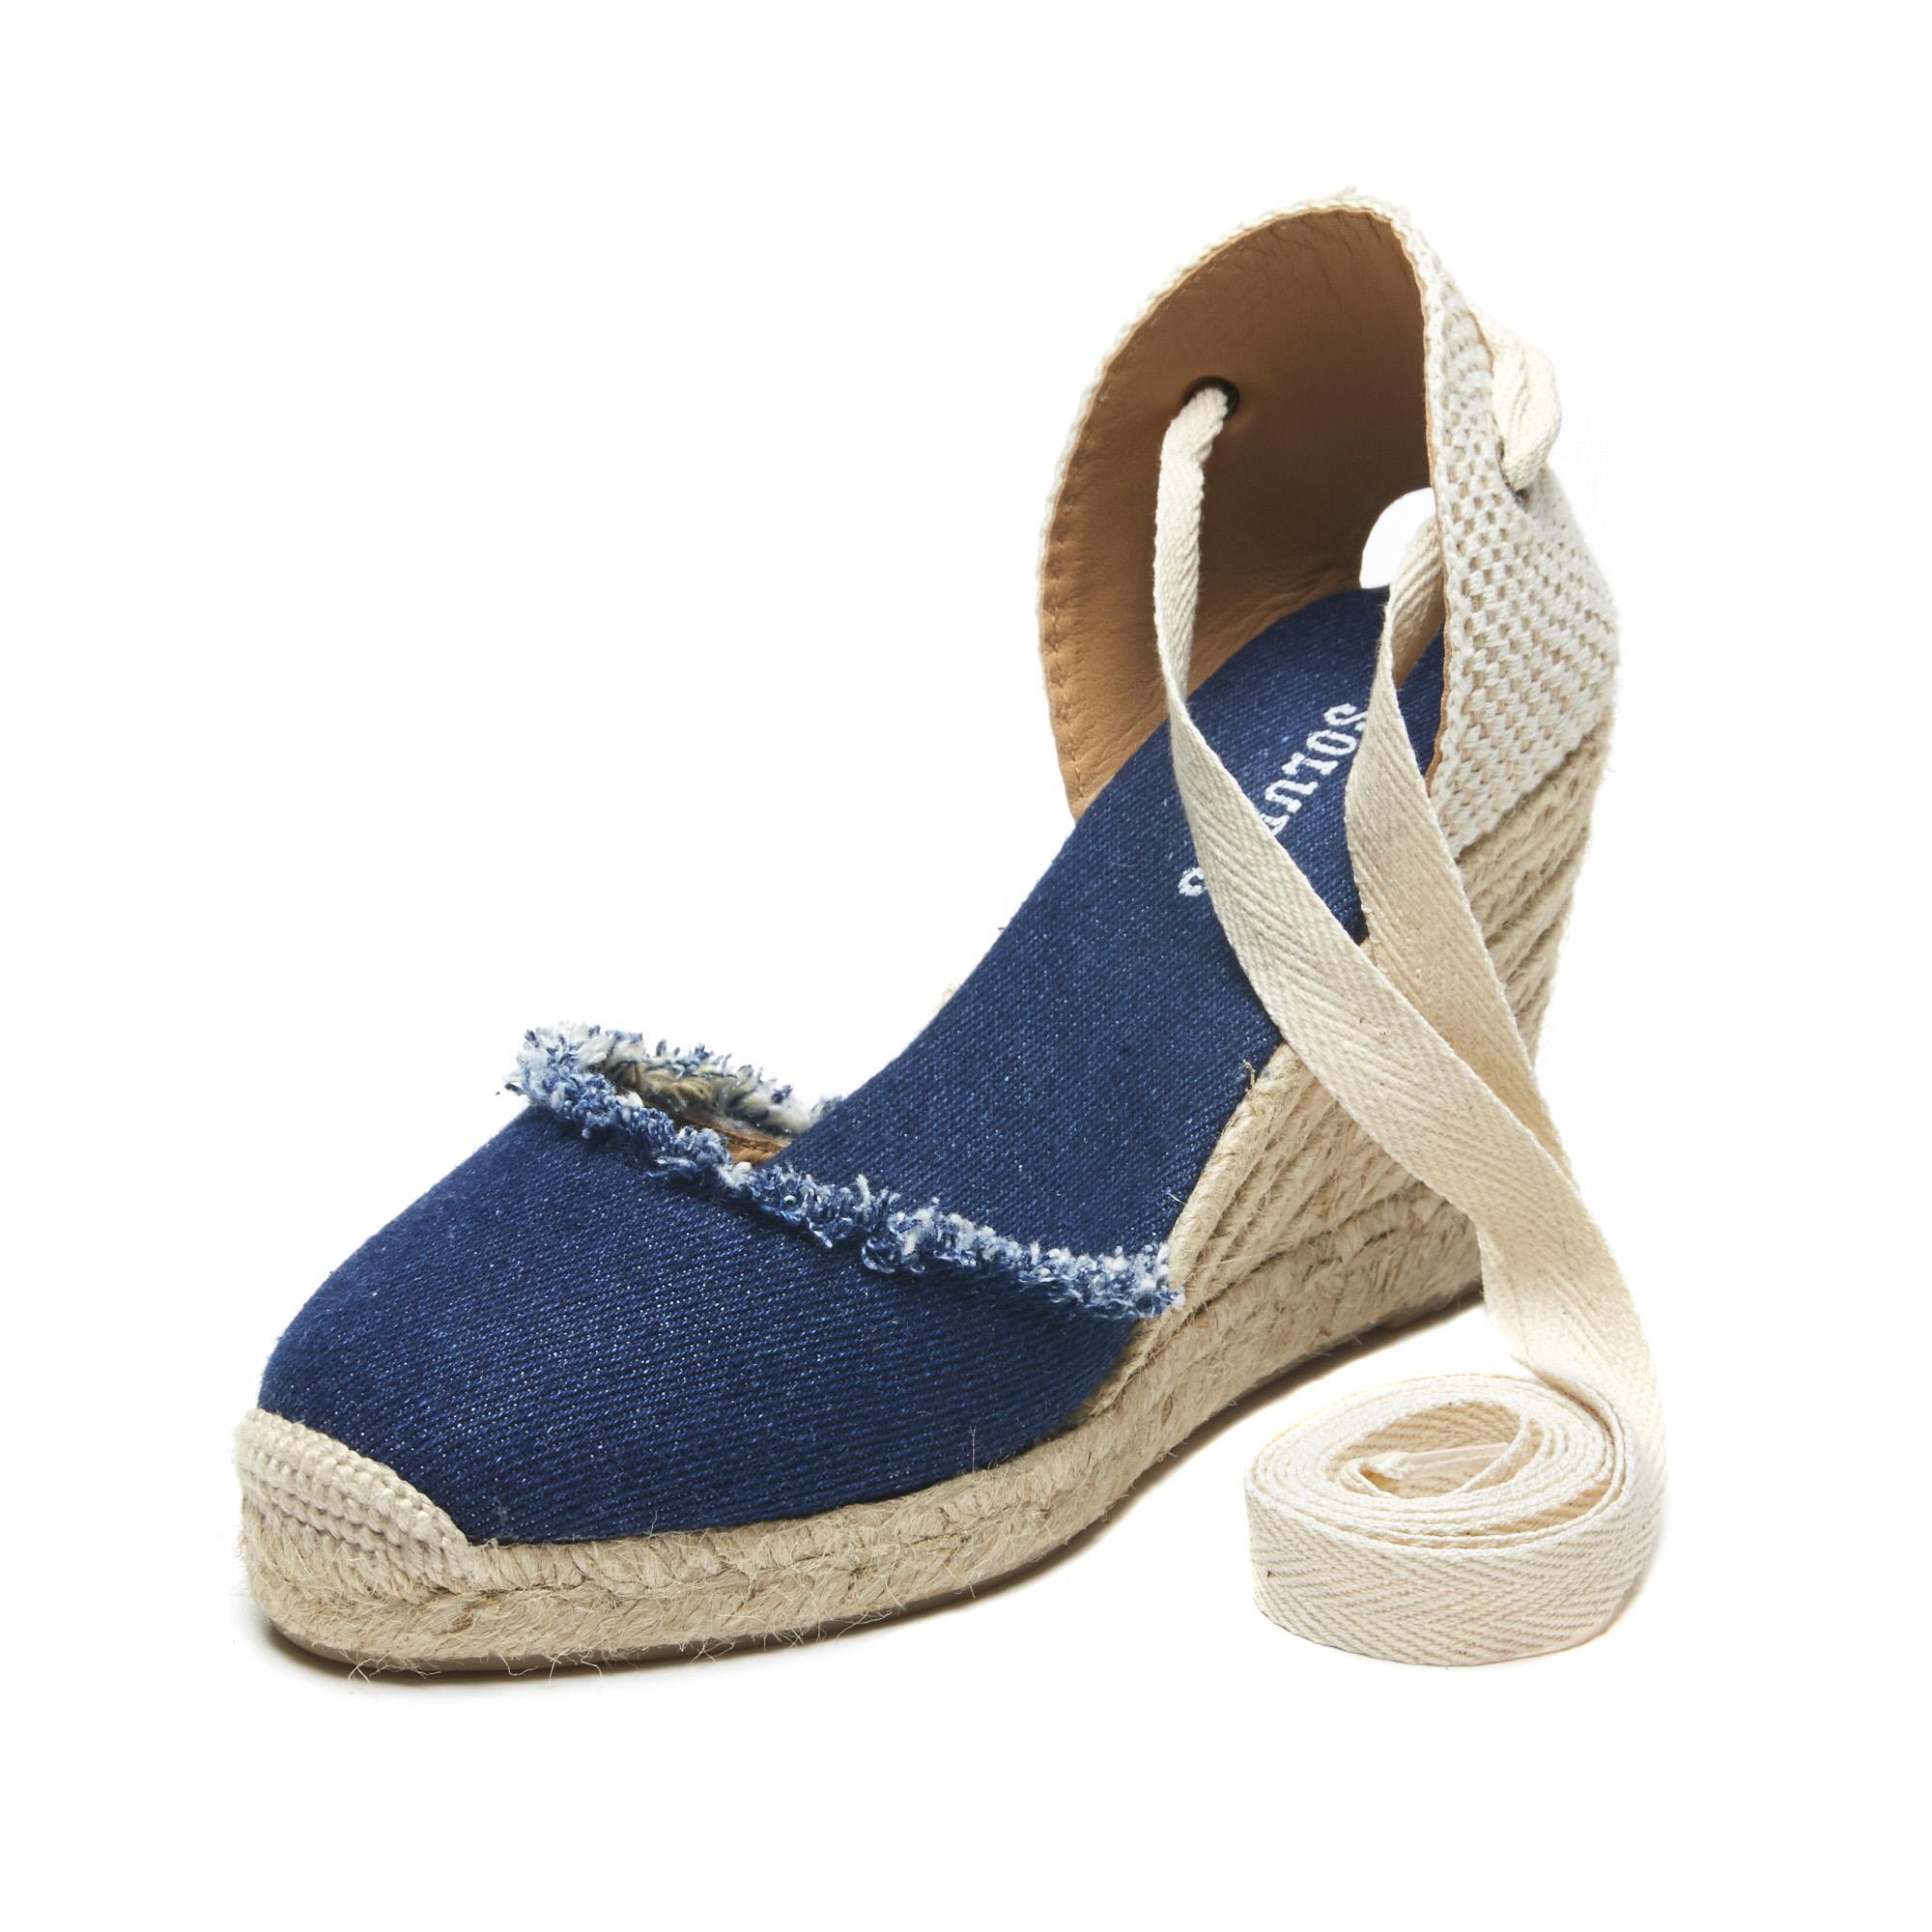 798cb720c Soludos Frayed Denim Espadrille Tall Wedge Sandal in Blue - Lyst